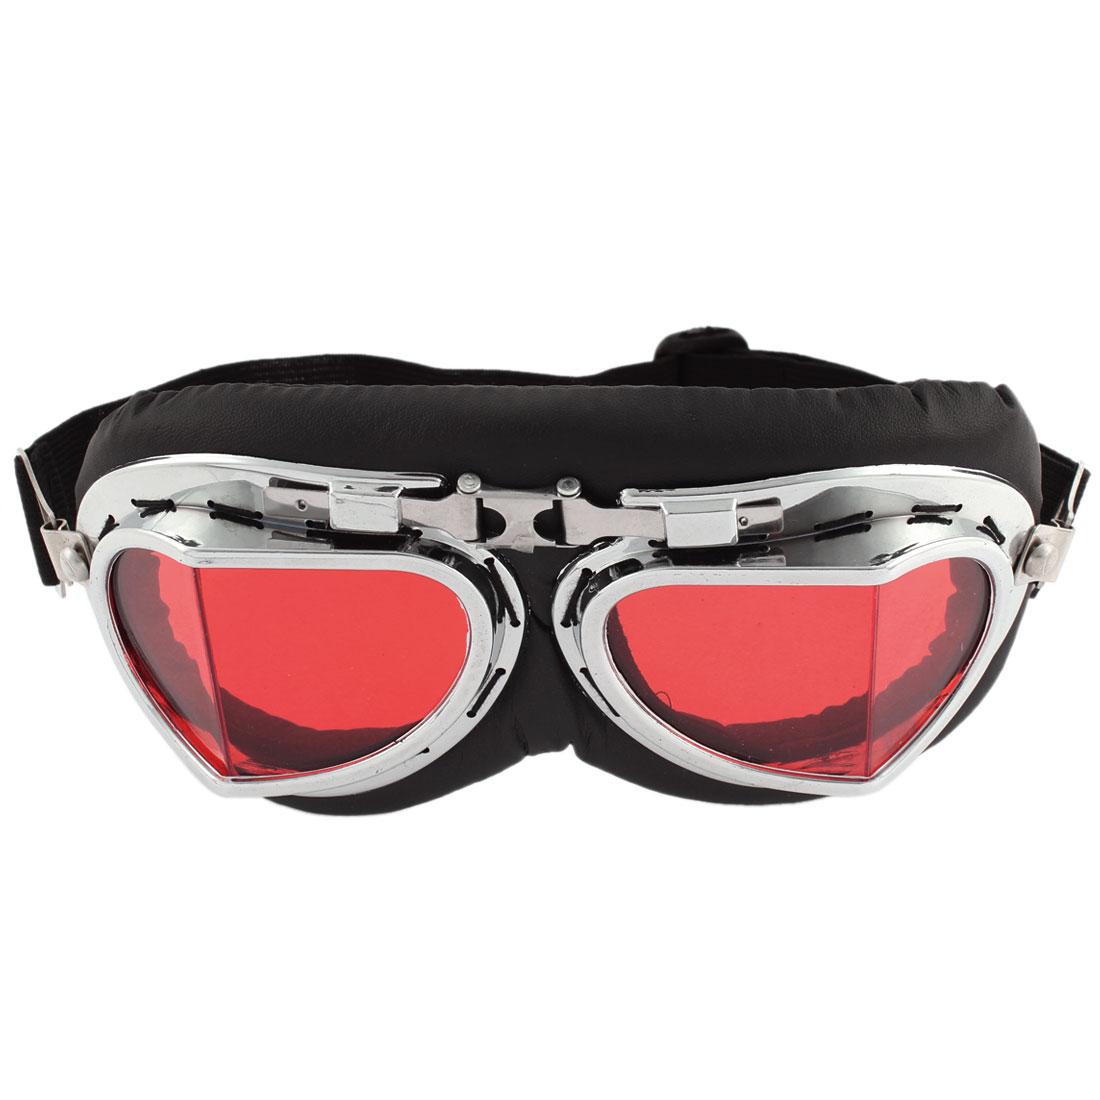 Unisex Full Frame Adjustable Strap Red Lens Ski Motorcycle Goggles Wind Glasses